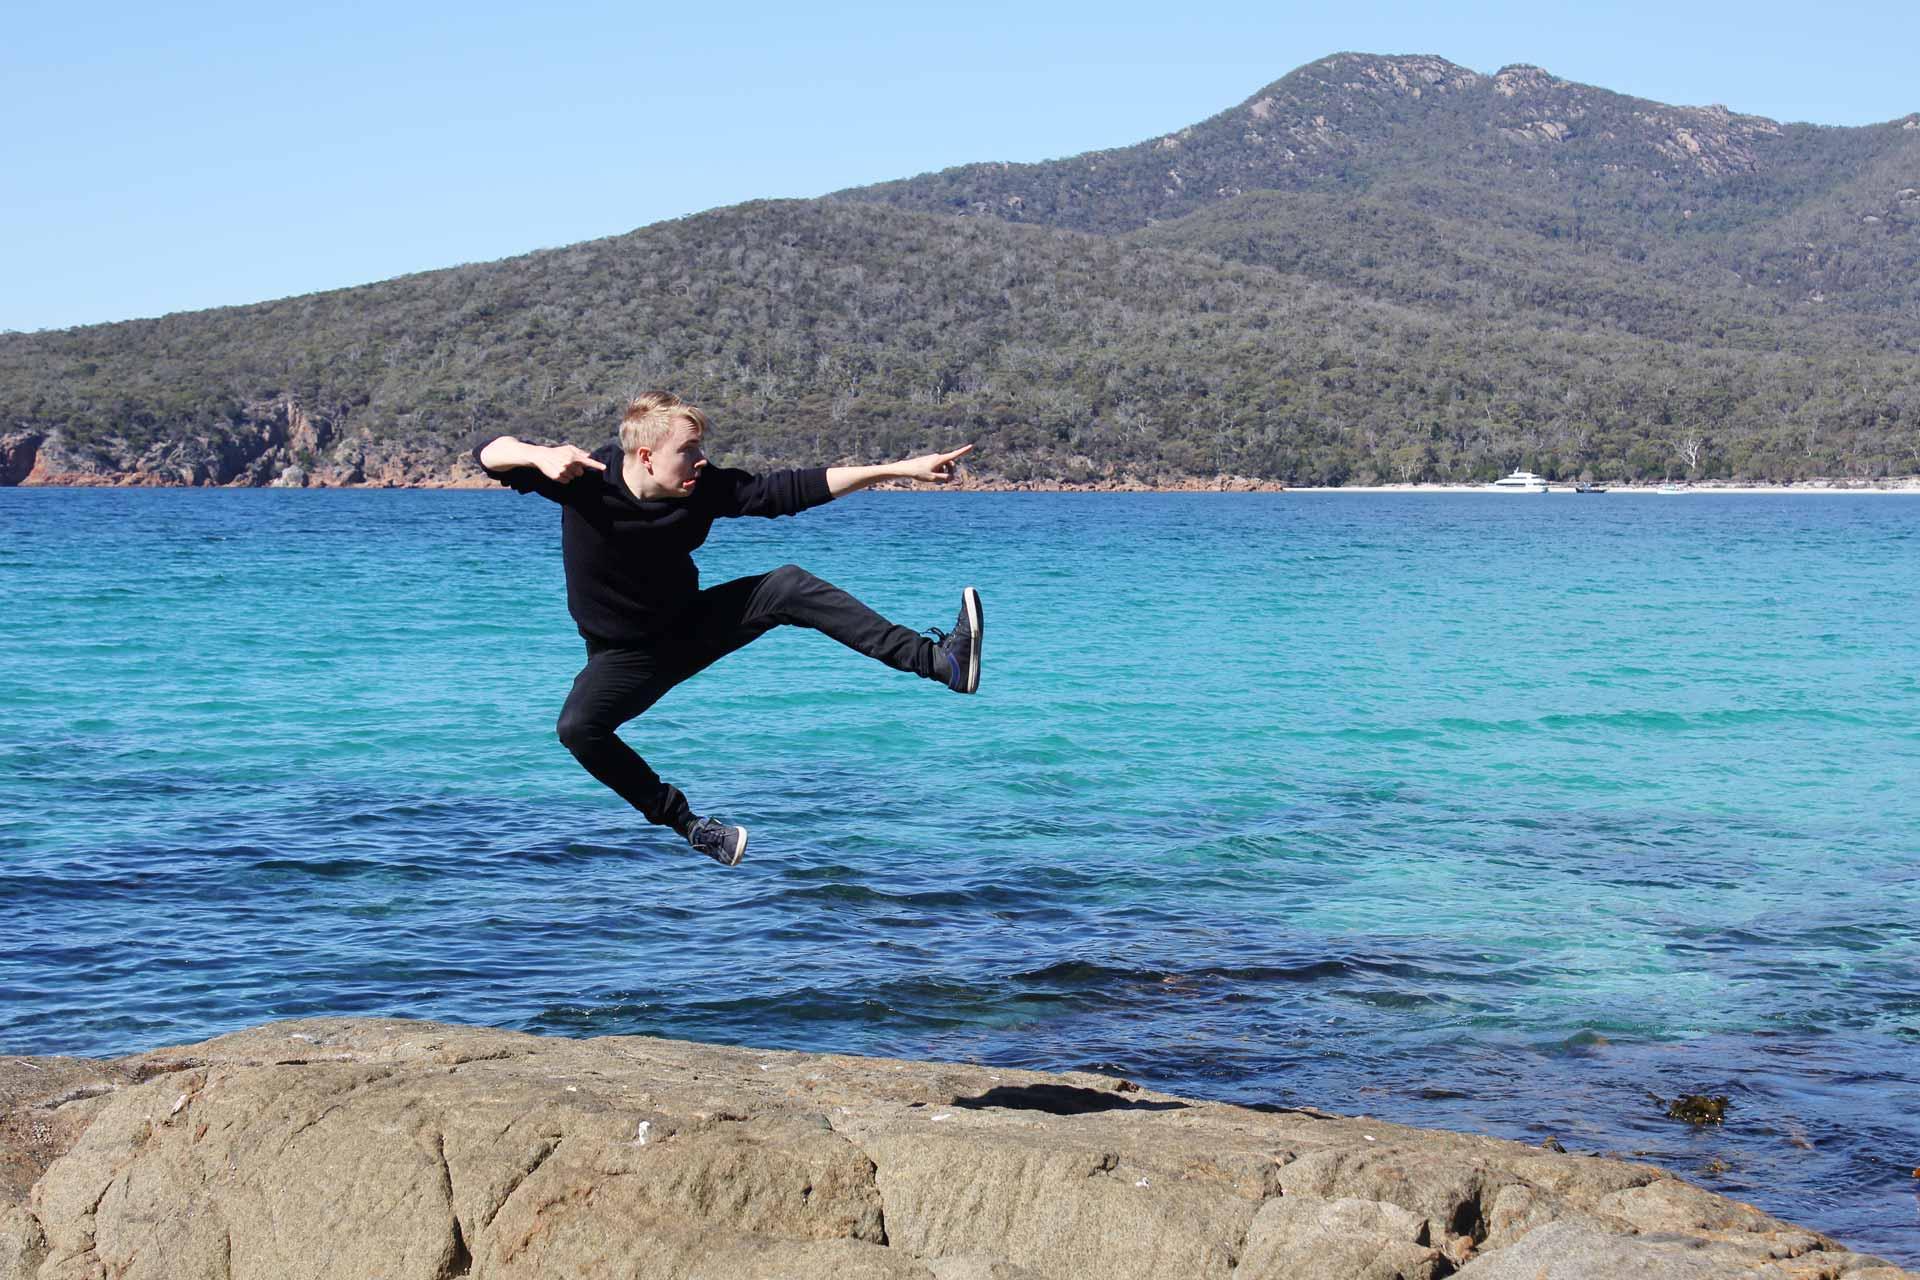 Mattias kicking the air at Wineglass Bay Tasmania